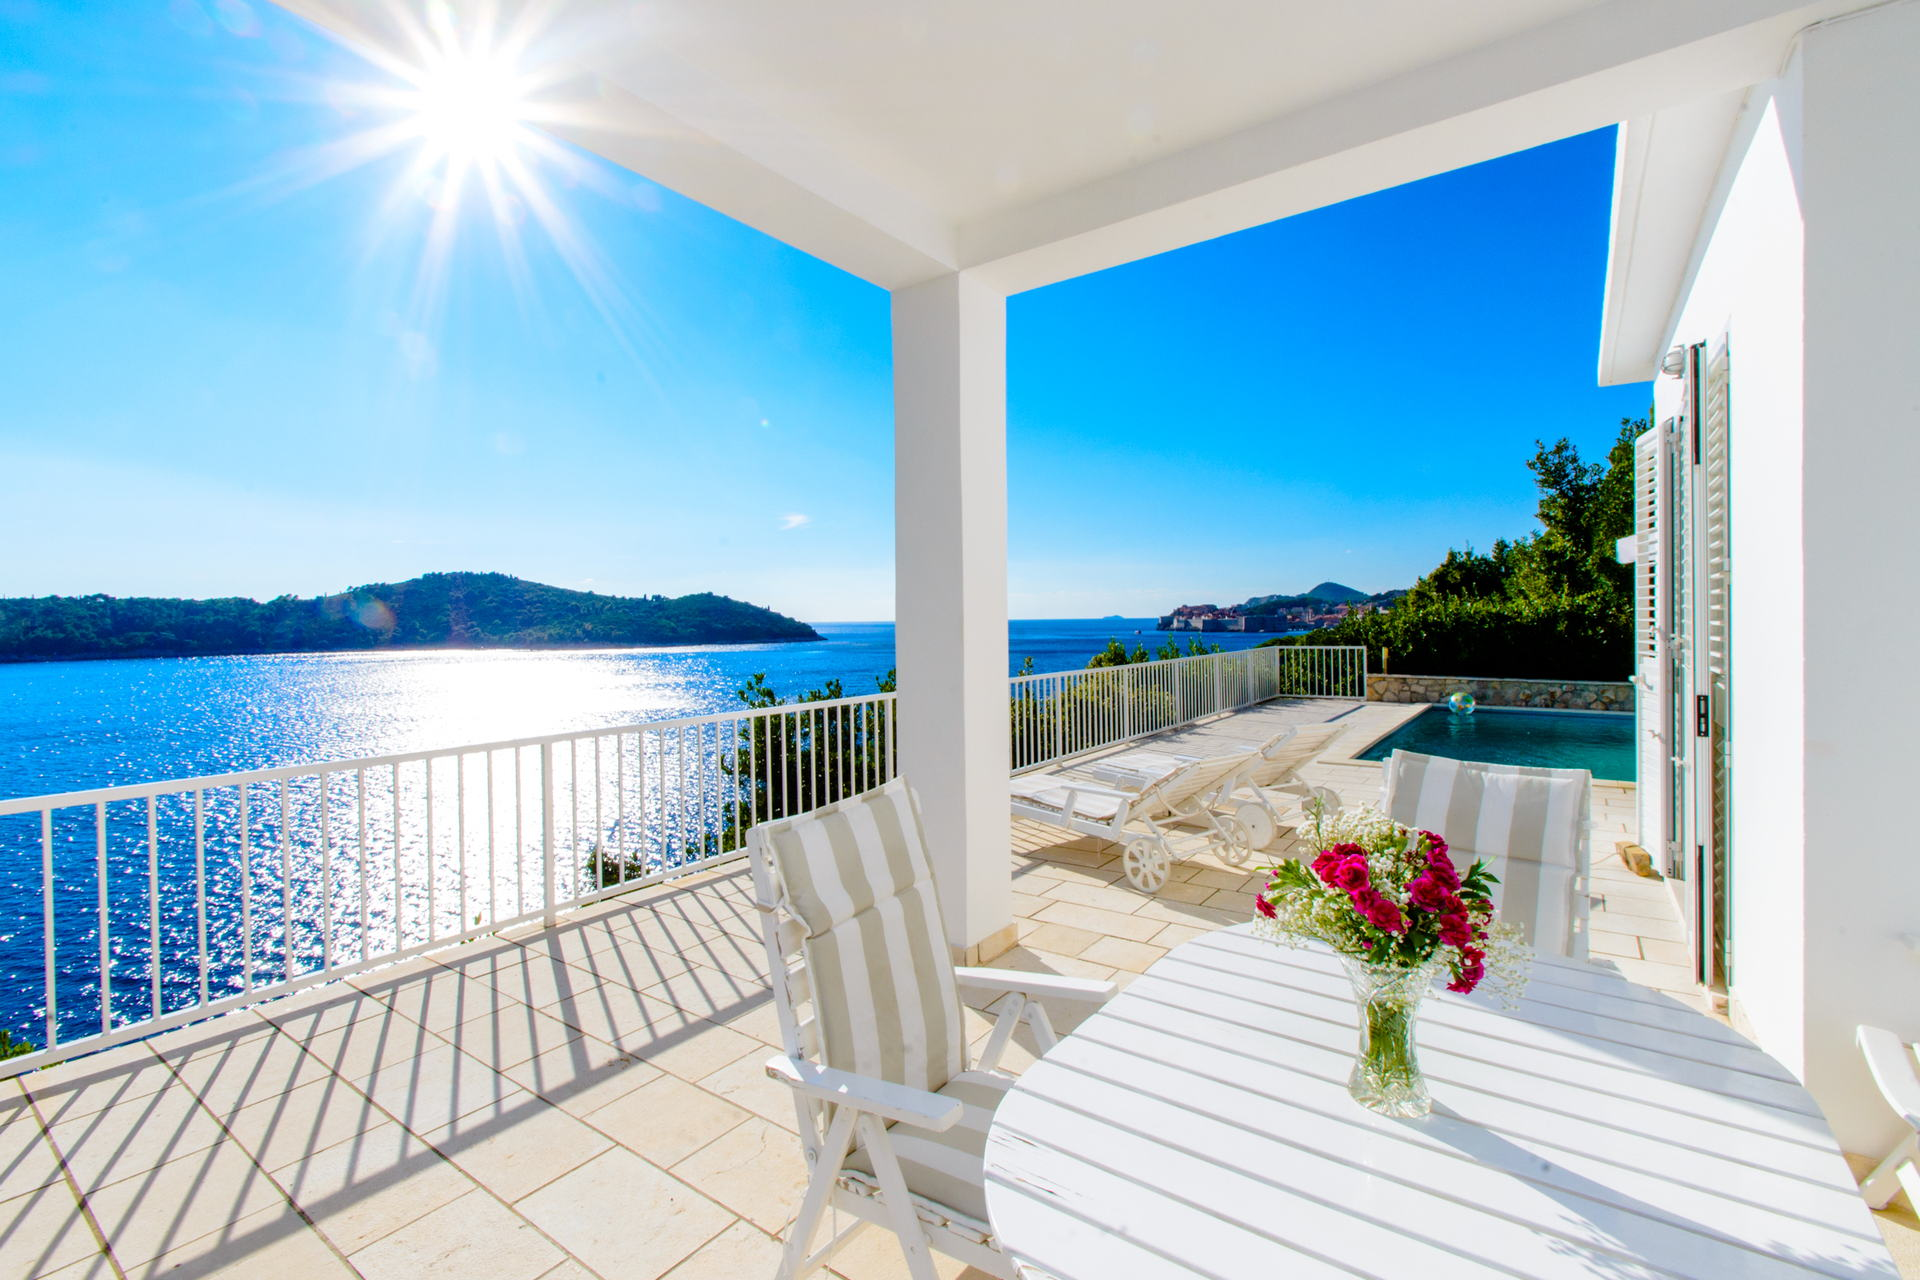 Villa Splendid View with Swimming Pool